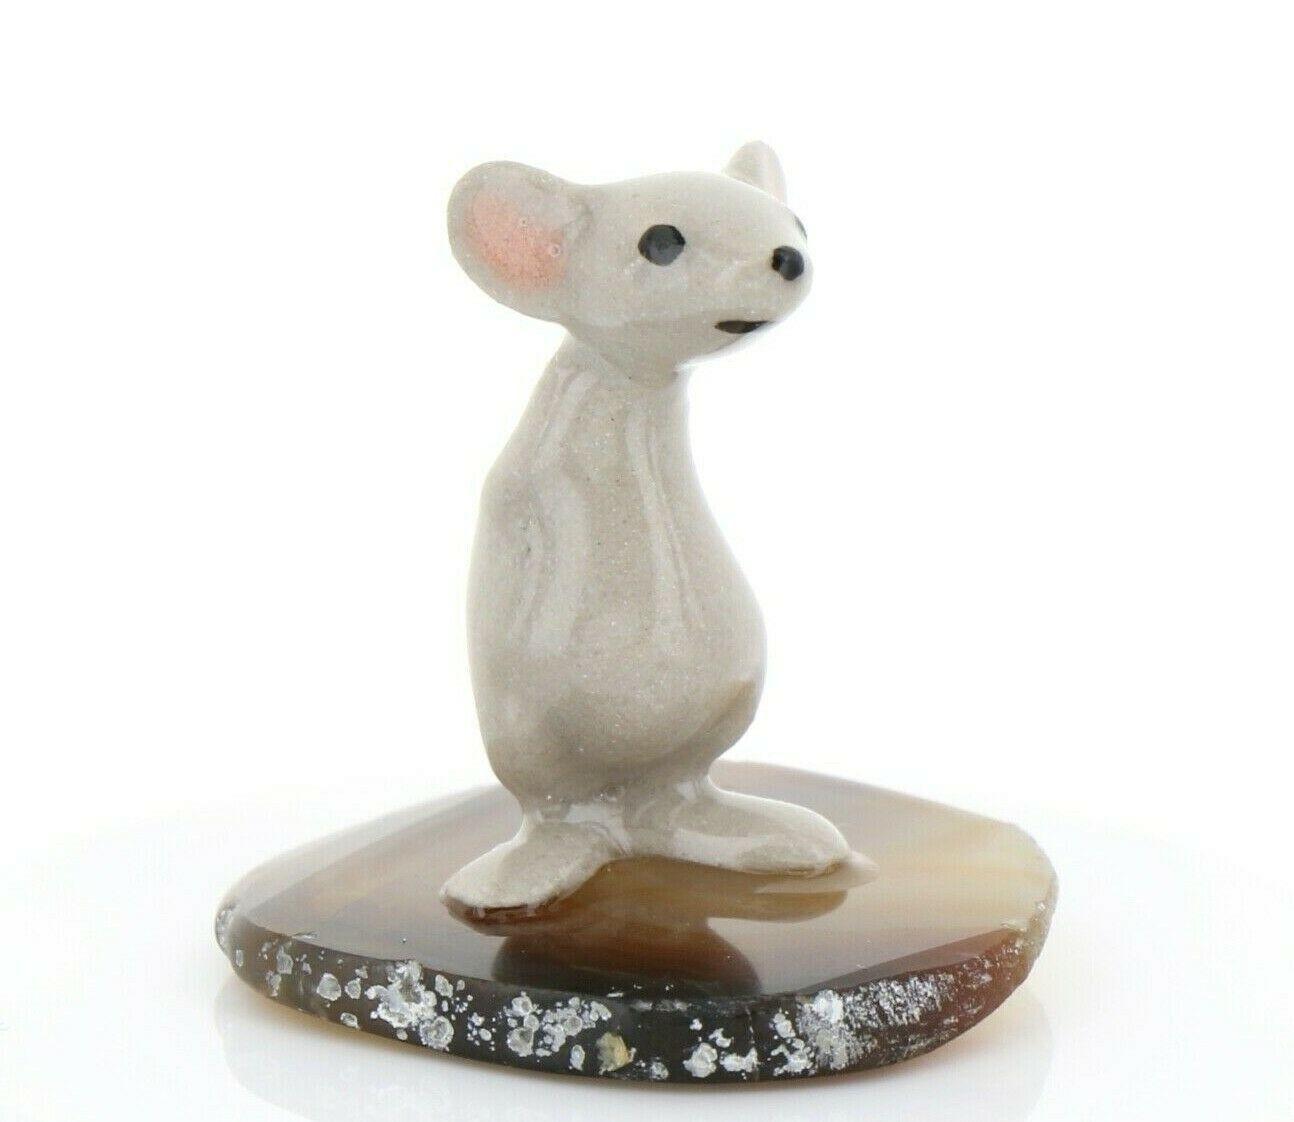 Stepping Stones Fairy Garden Miniature Mouse Standing on Sliced Quartz Base 2740